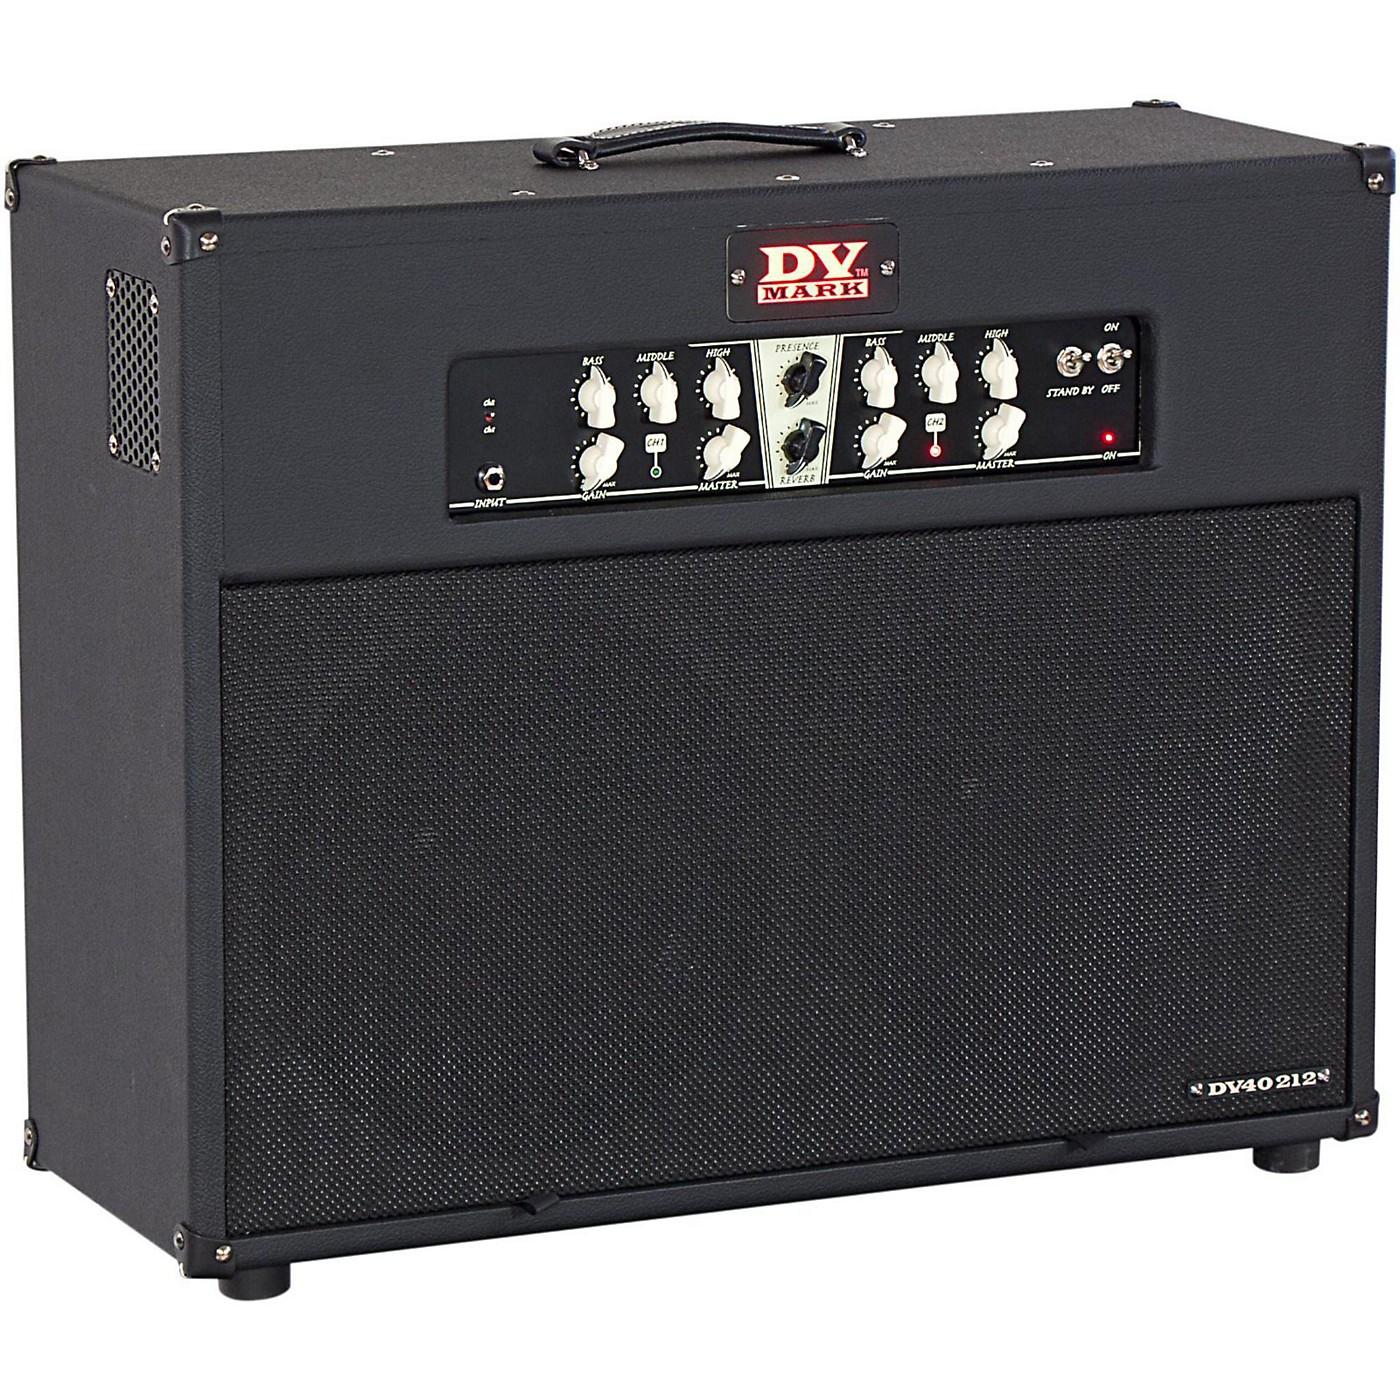 DV Mark DV 40 212 40 Watt 2x12 Guitar Combo thumbnail